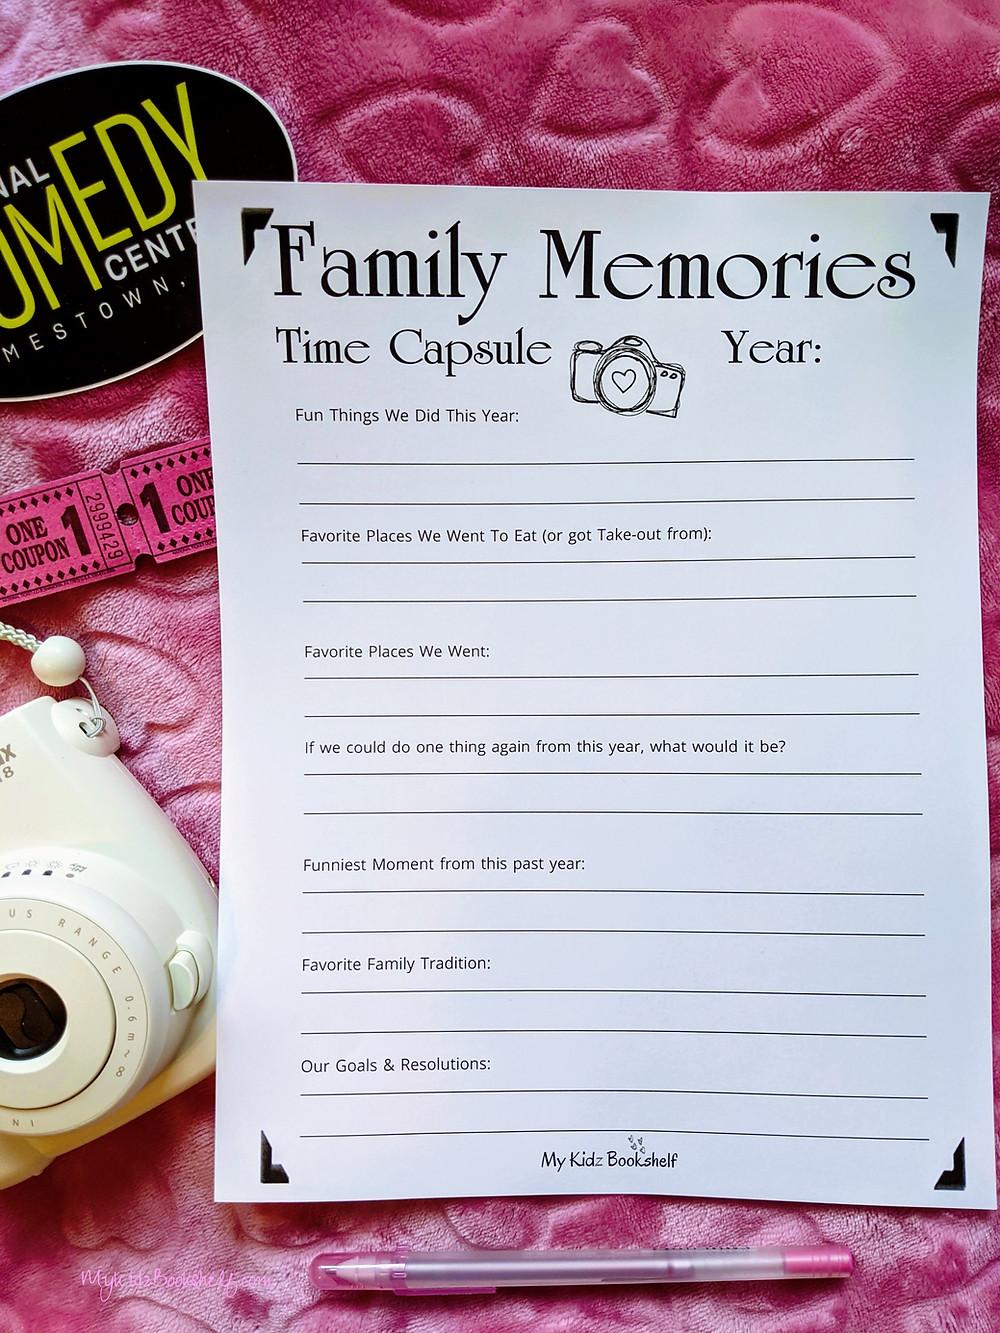 Time-Capsule-Family-Memories-questionnaire